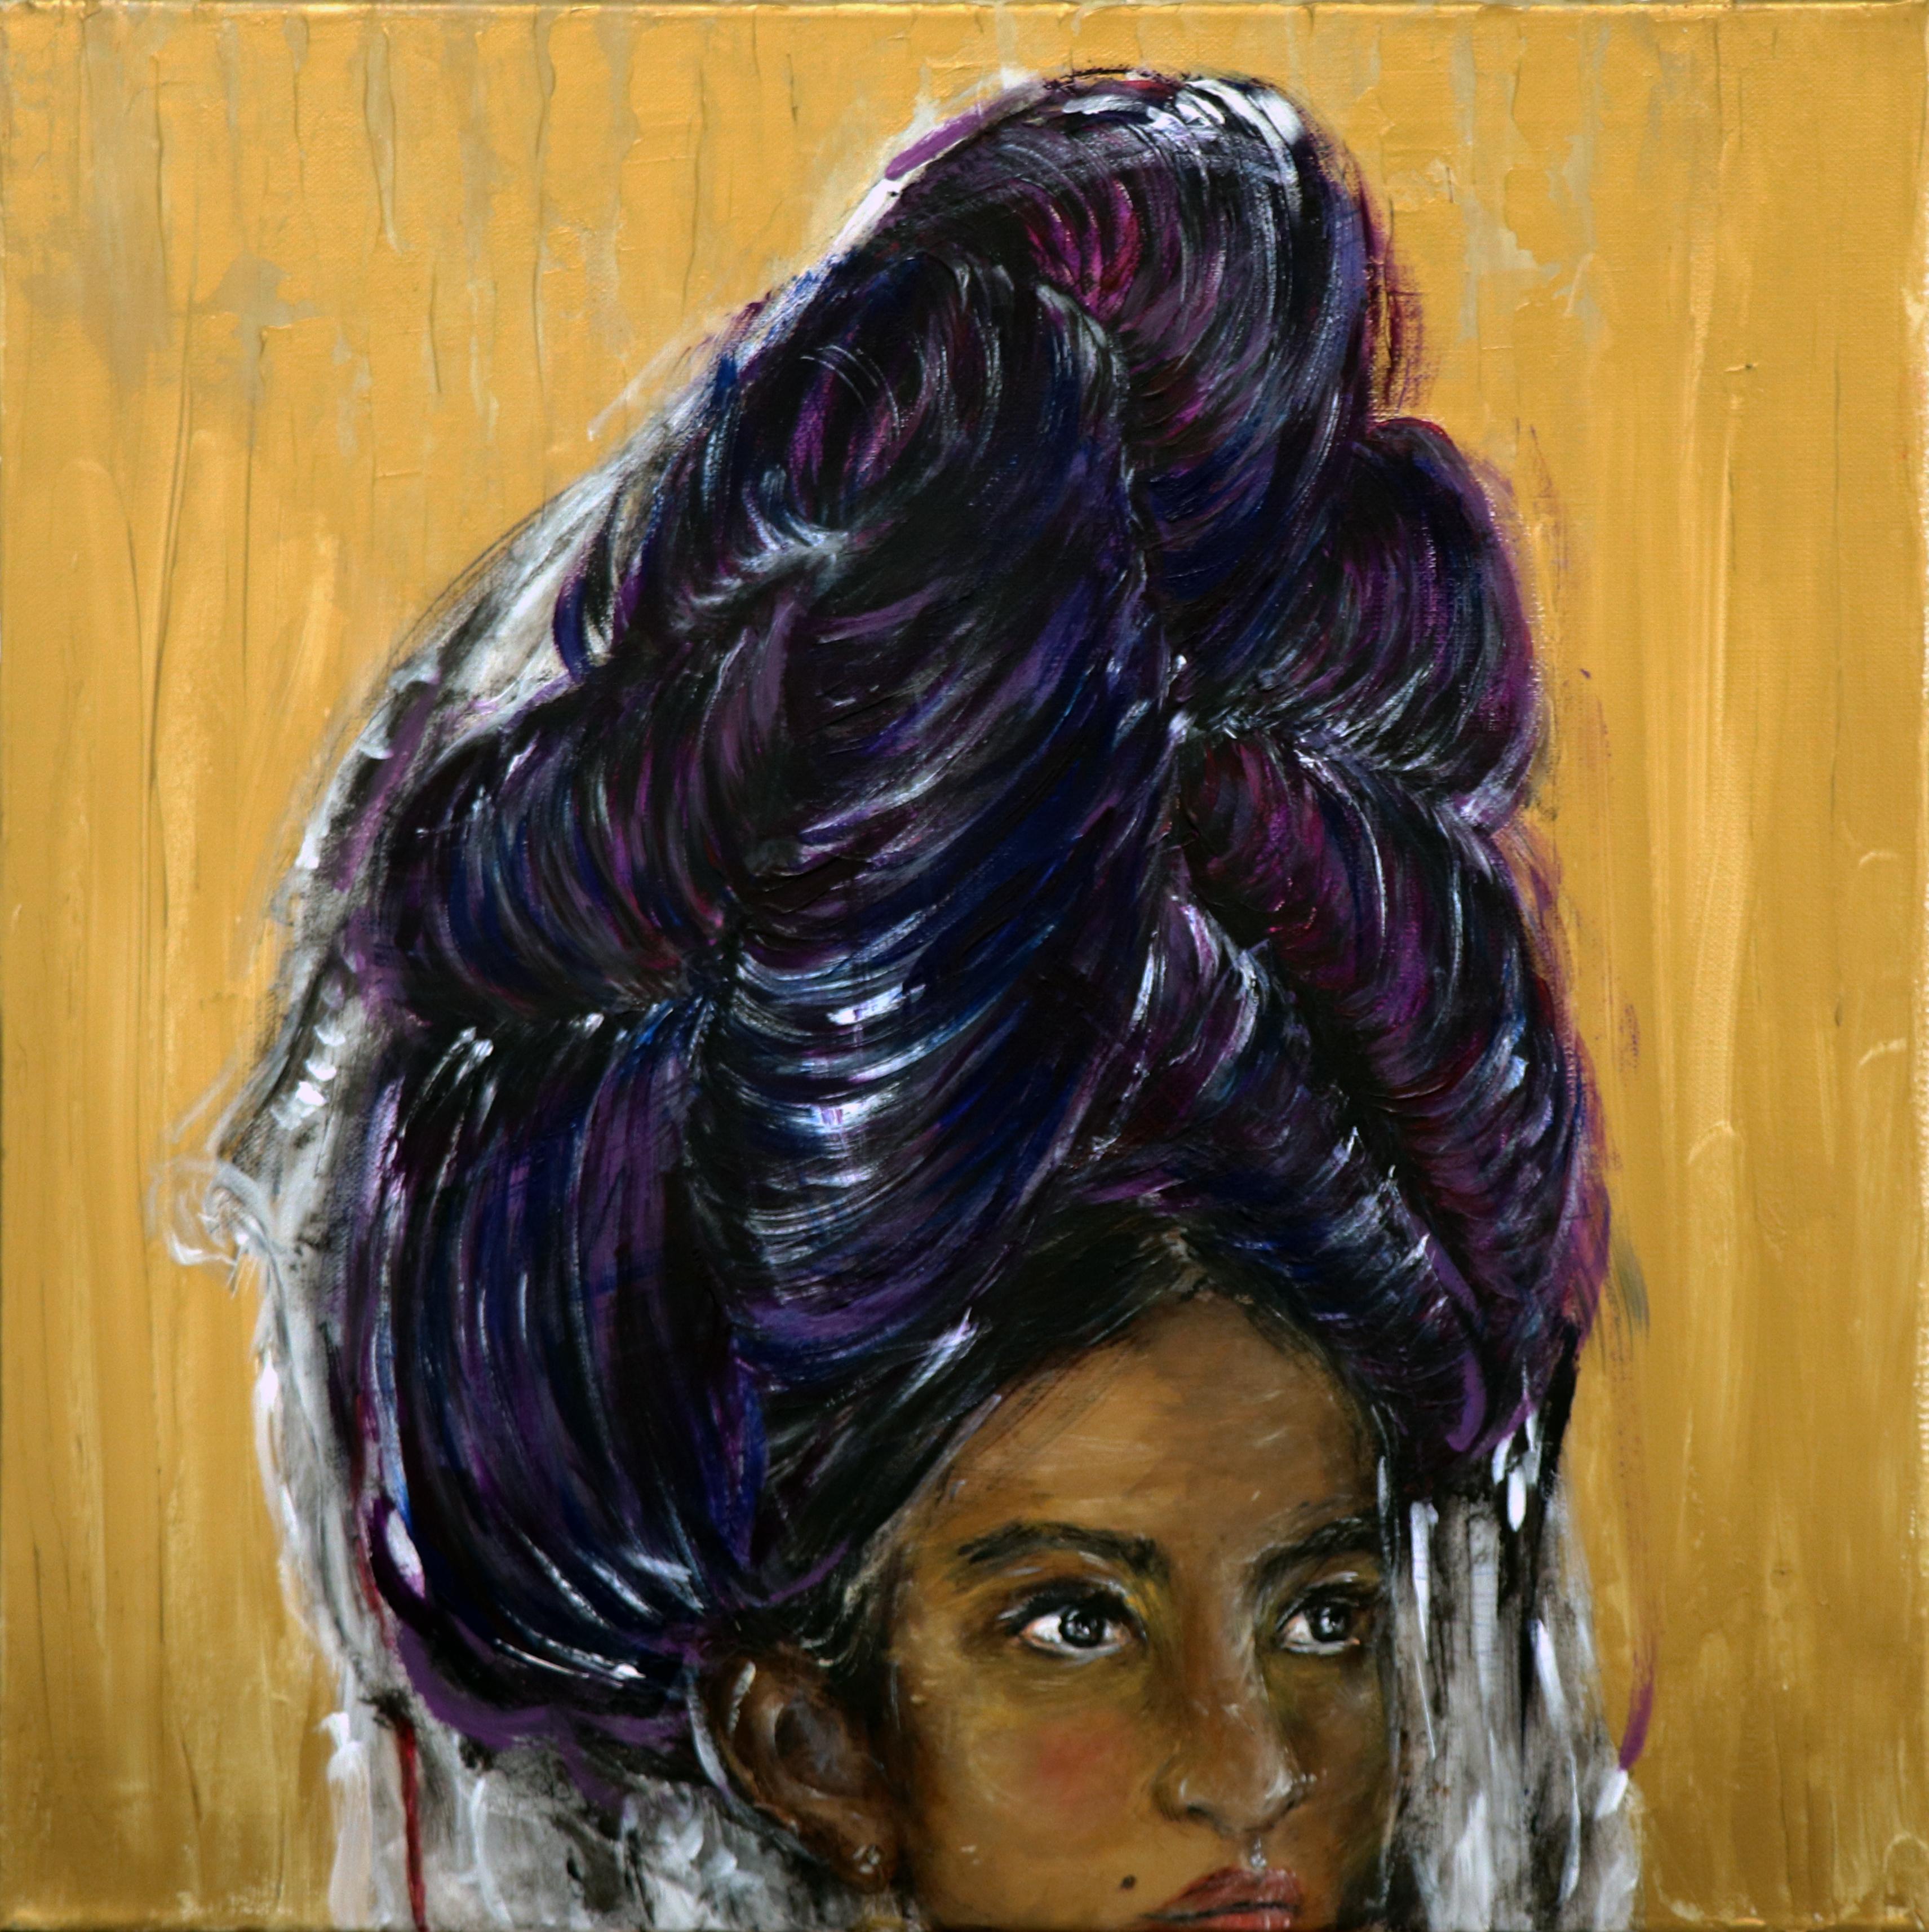 La reine Nahua - 50x50 - Pintora mexicana